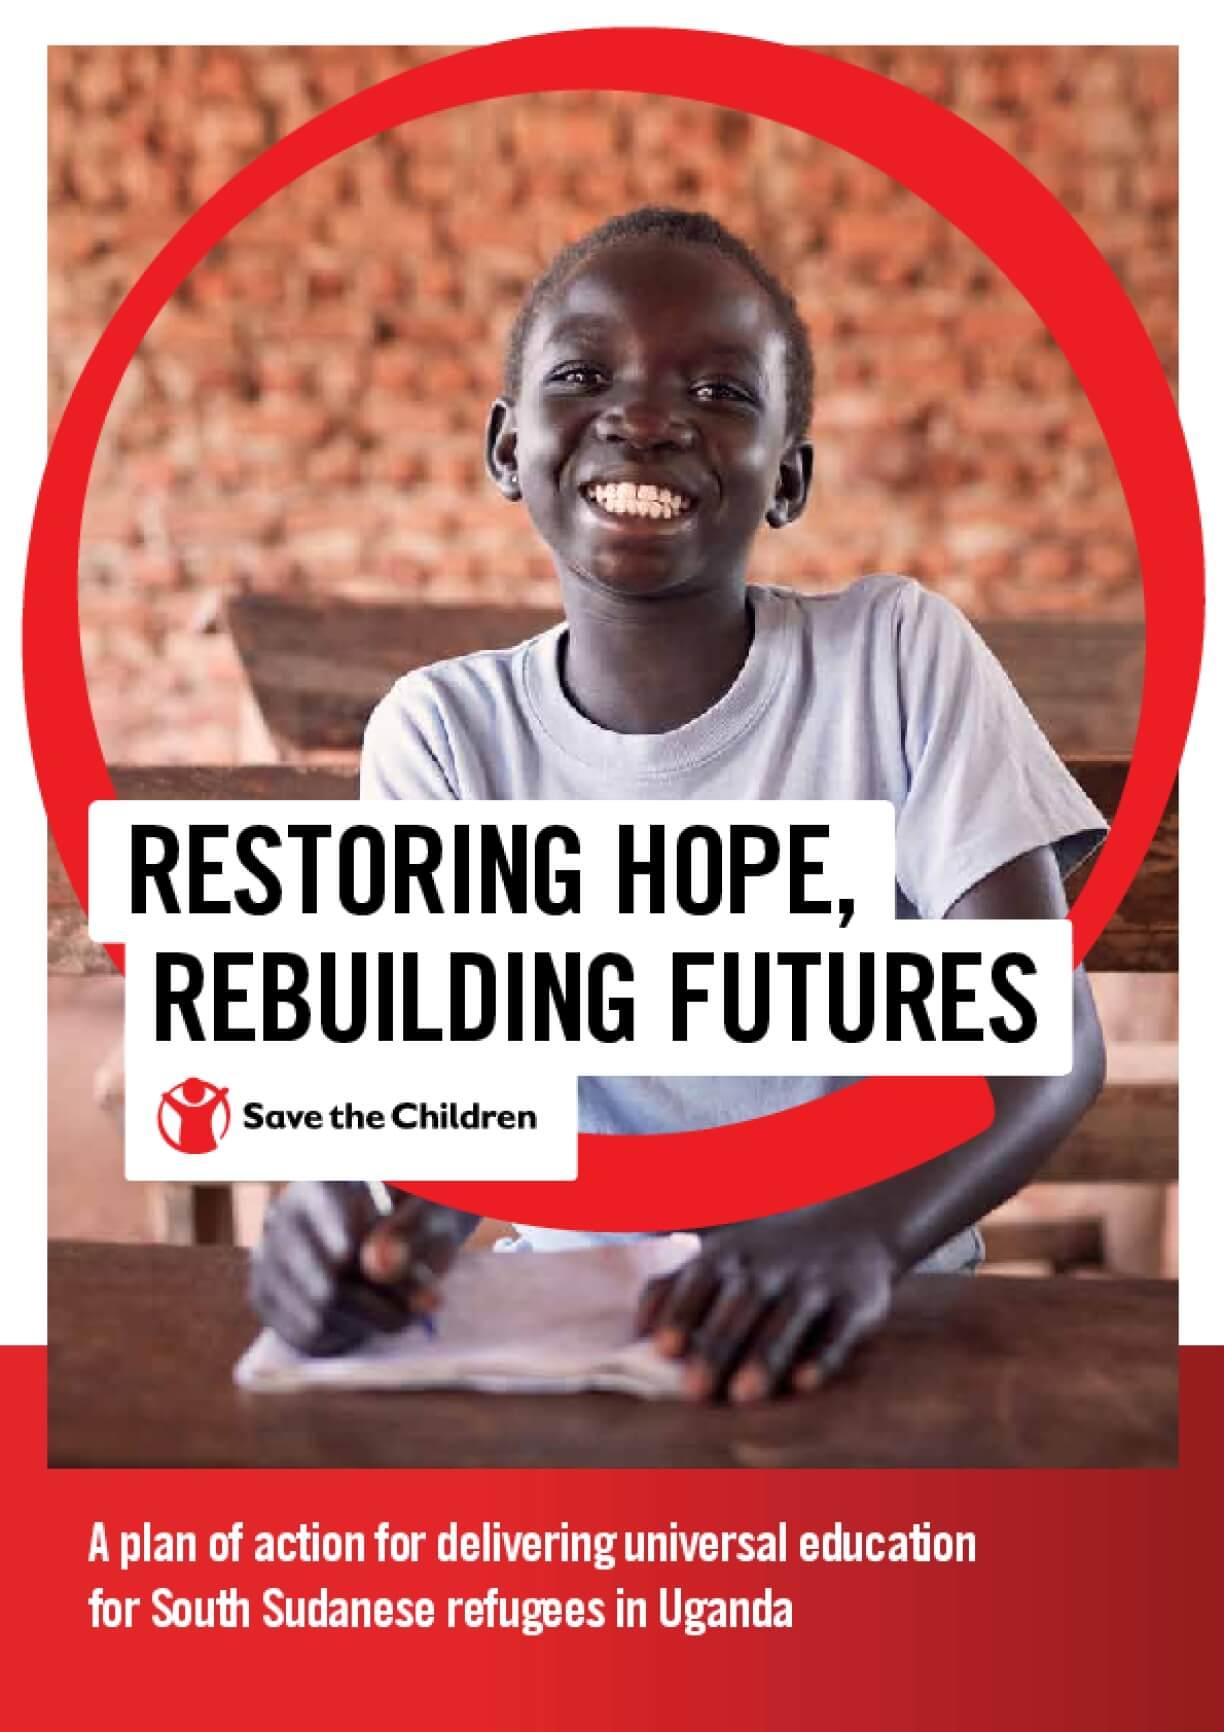 Restoring Hope, Rebuilding Futures: A Plan of Action for Delivering Universal Education for South Sudanese Refugees in Uganda